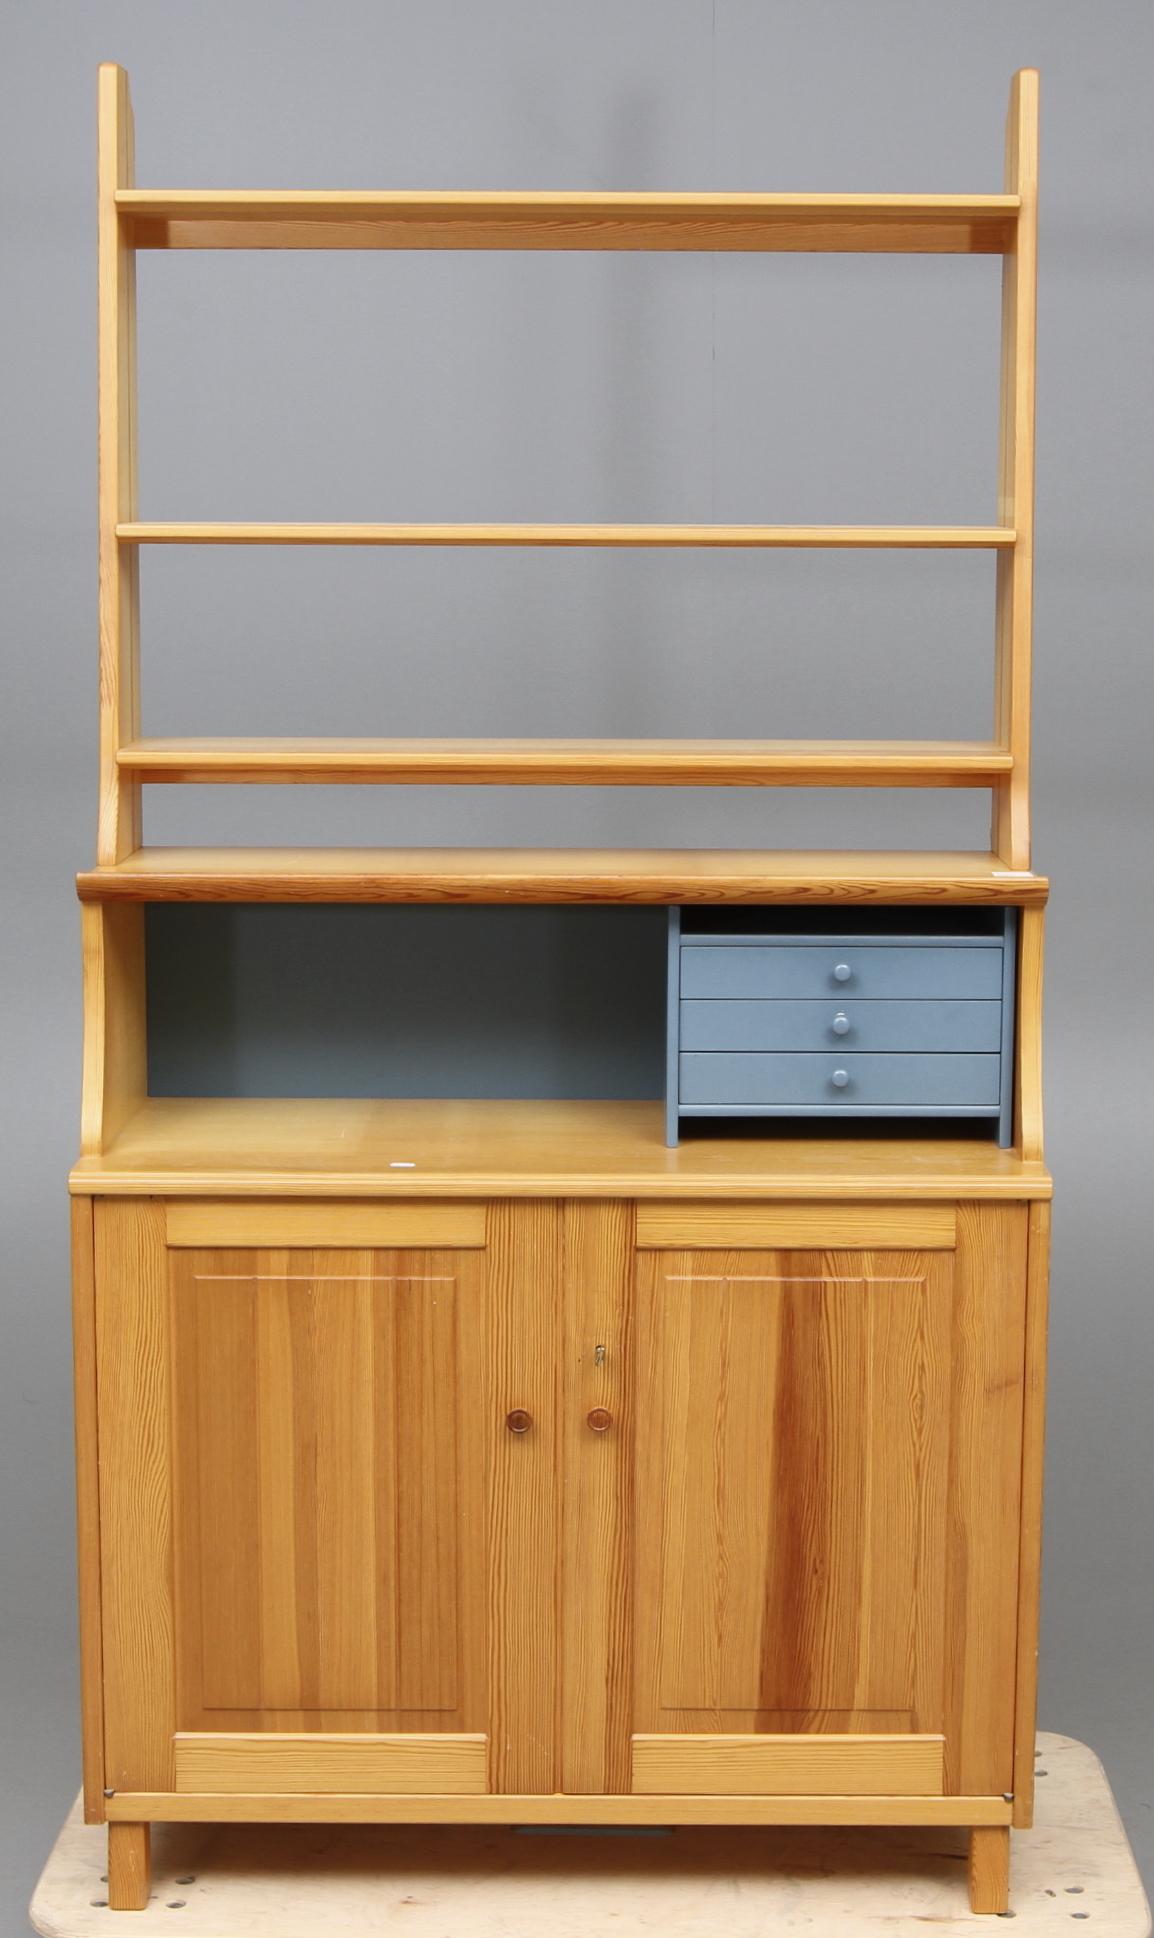 "Images for 63868 BOKHYLLA,""Visingsö"", Carl Malmsten, 1900 talets tredje kvartal Auctionet"